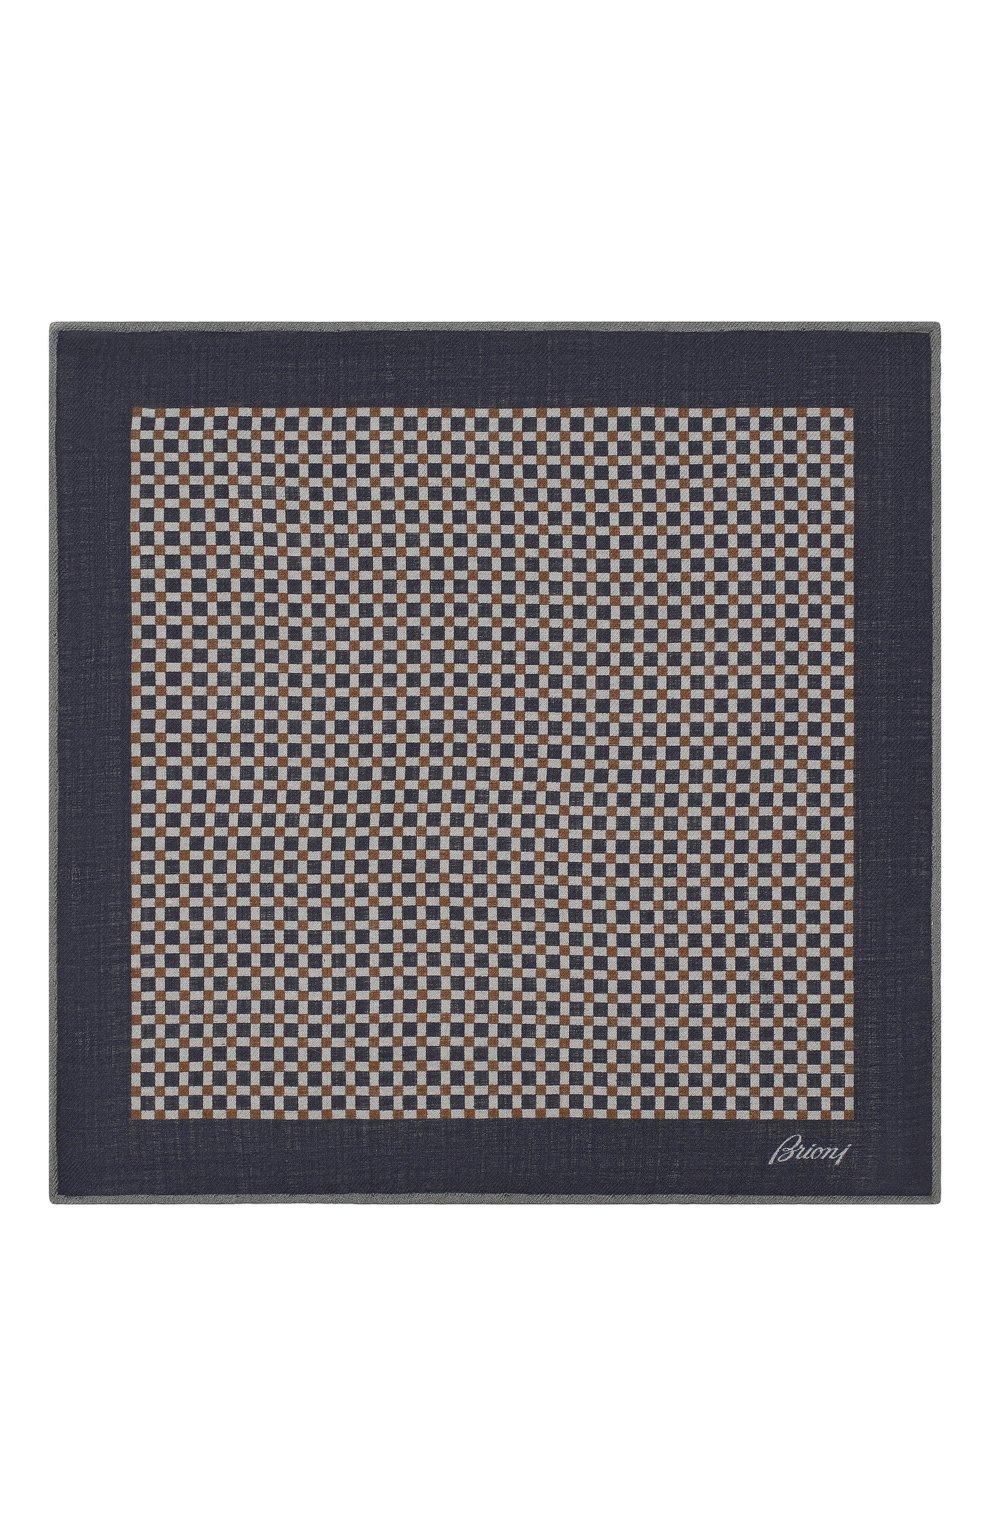 Мужской платок из смеси шерсти и шелка BRIONI синего цвета, арт. 071000/08A9G   Фото 3